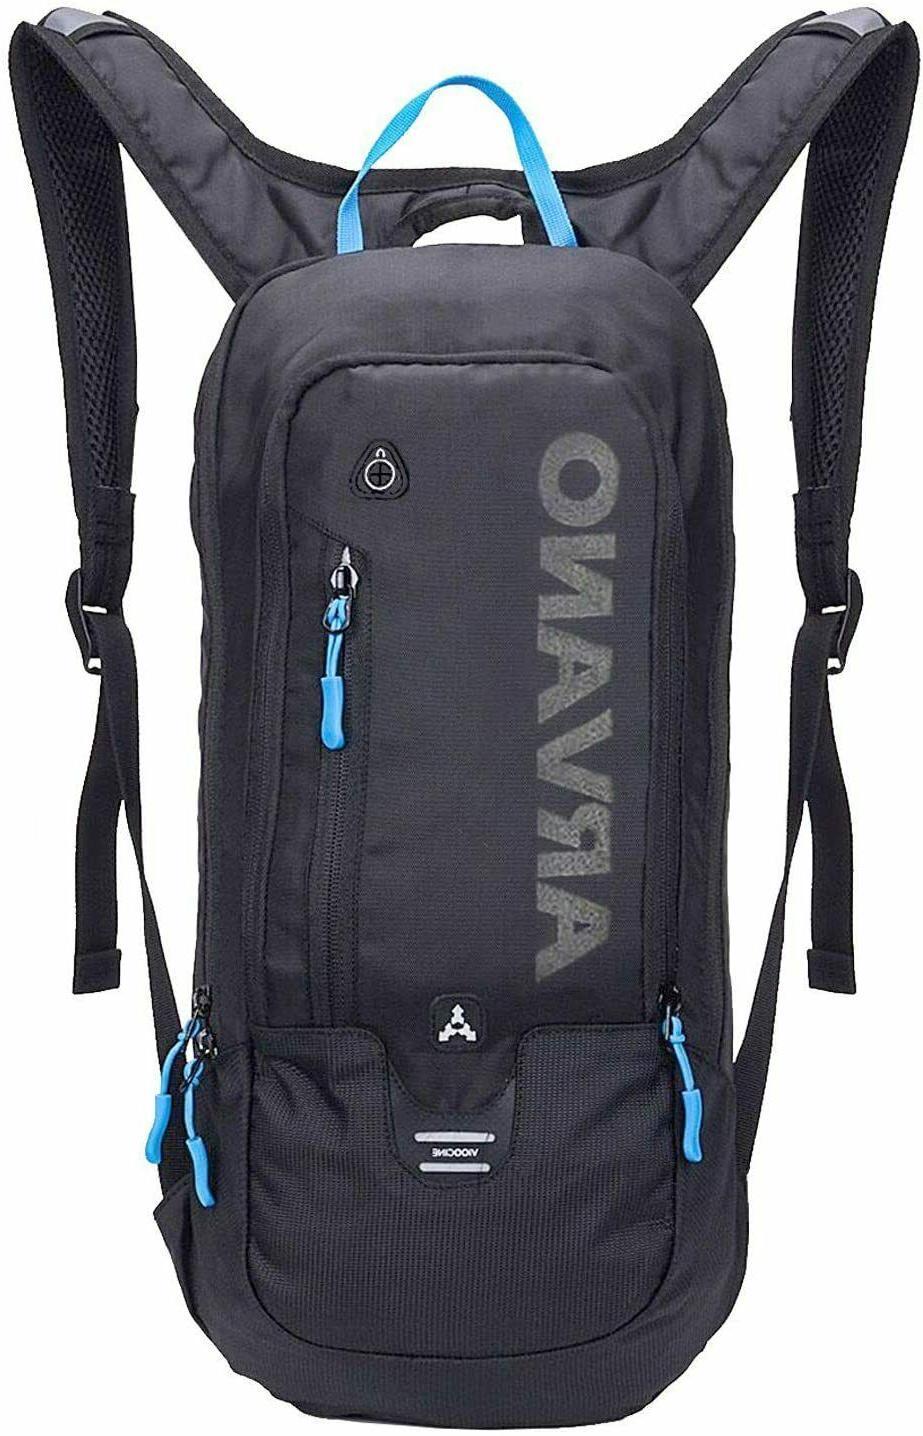 mountain bike backpack cycling backpack 6l breathable